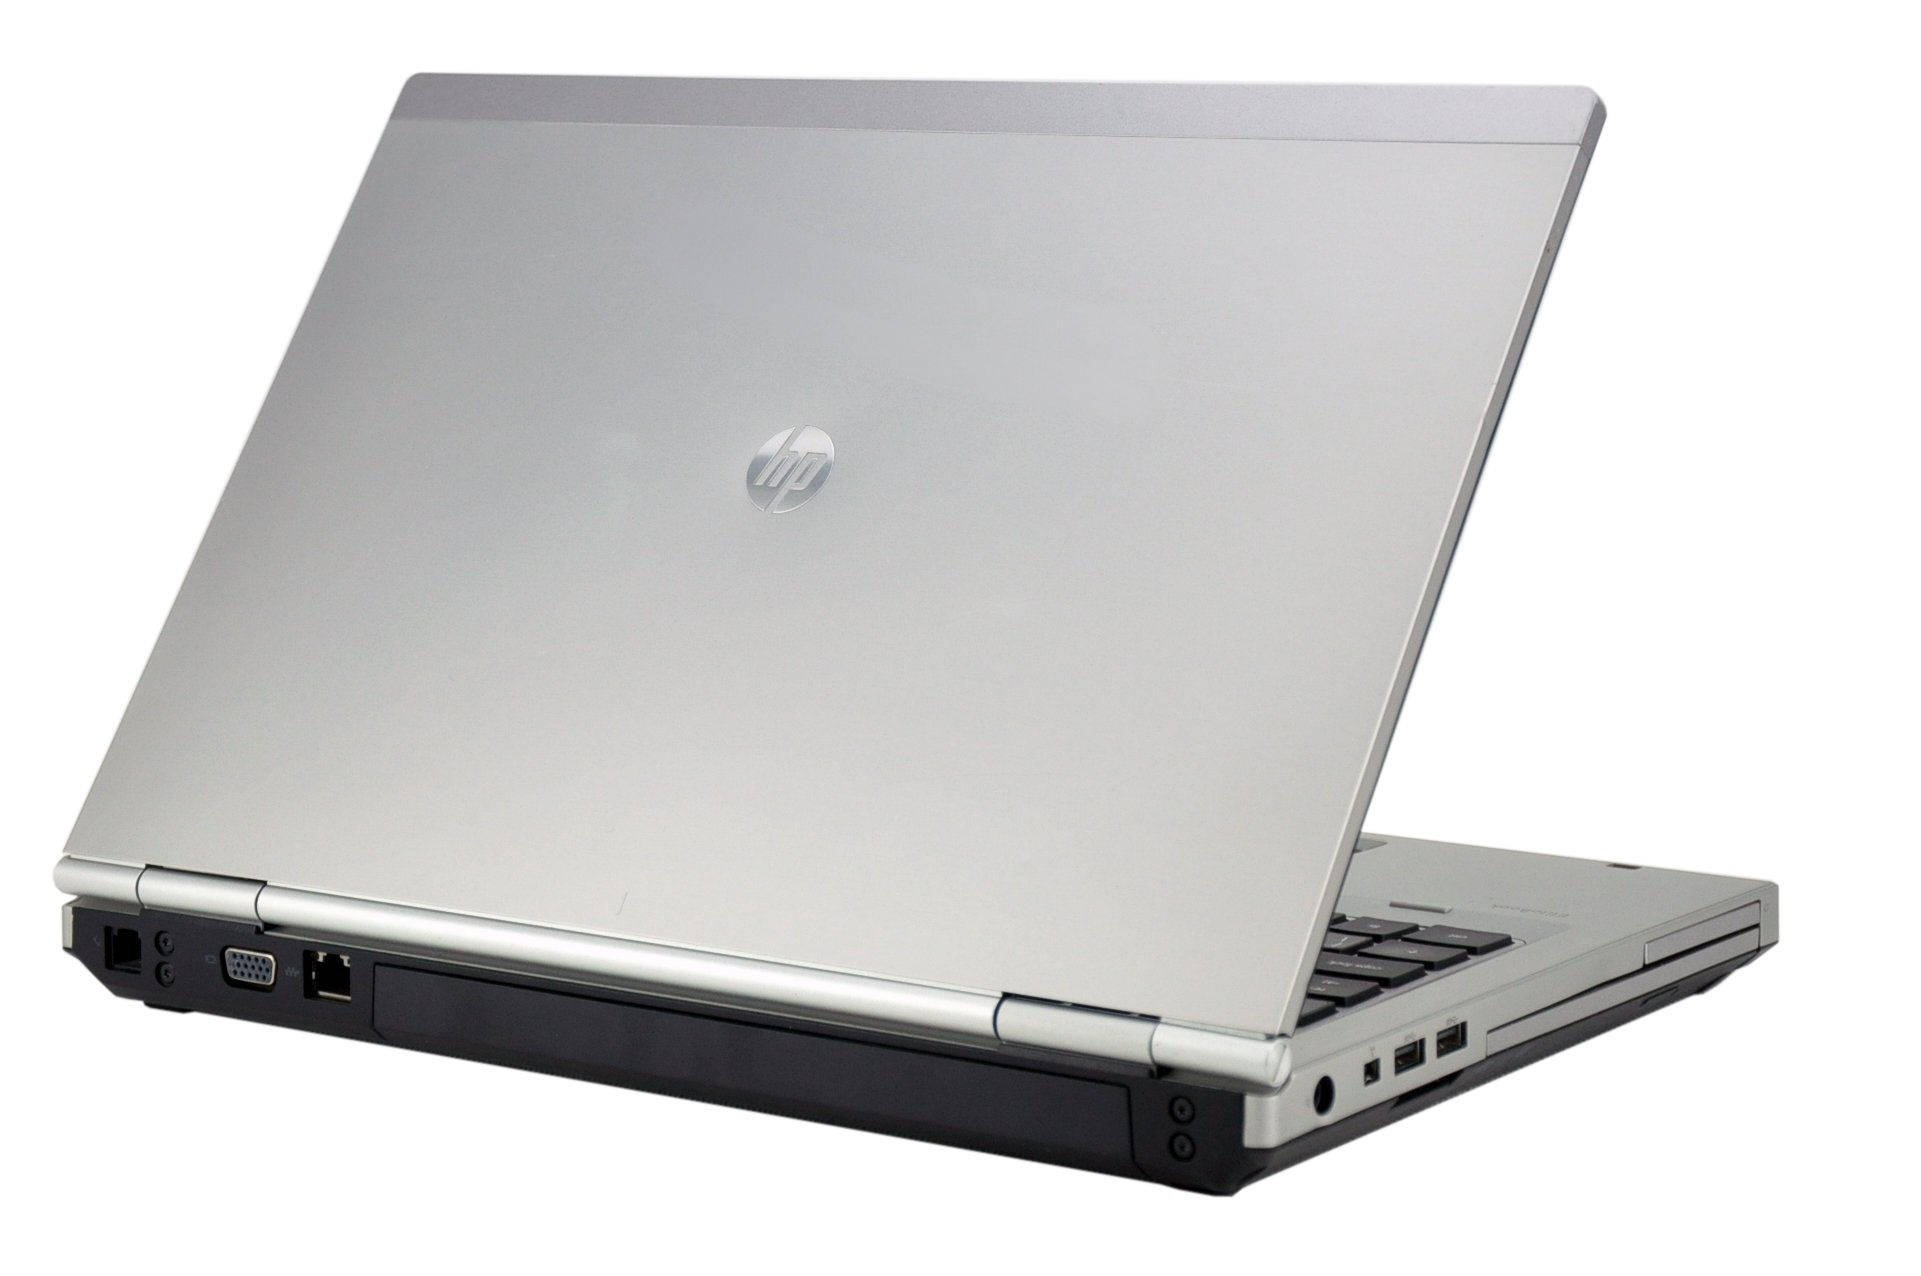 HP 8460p tani laptop